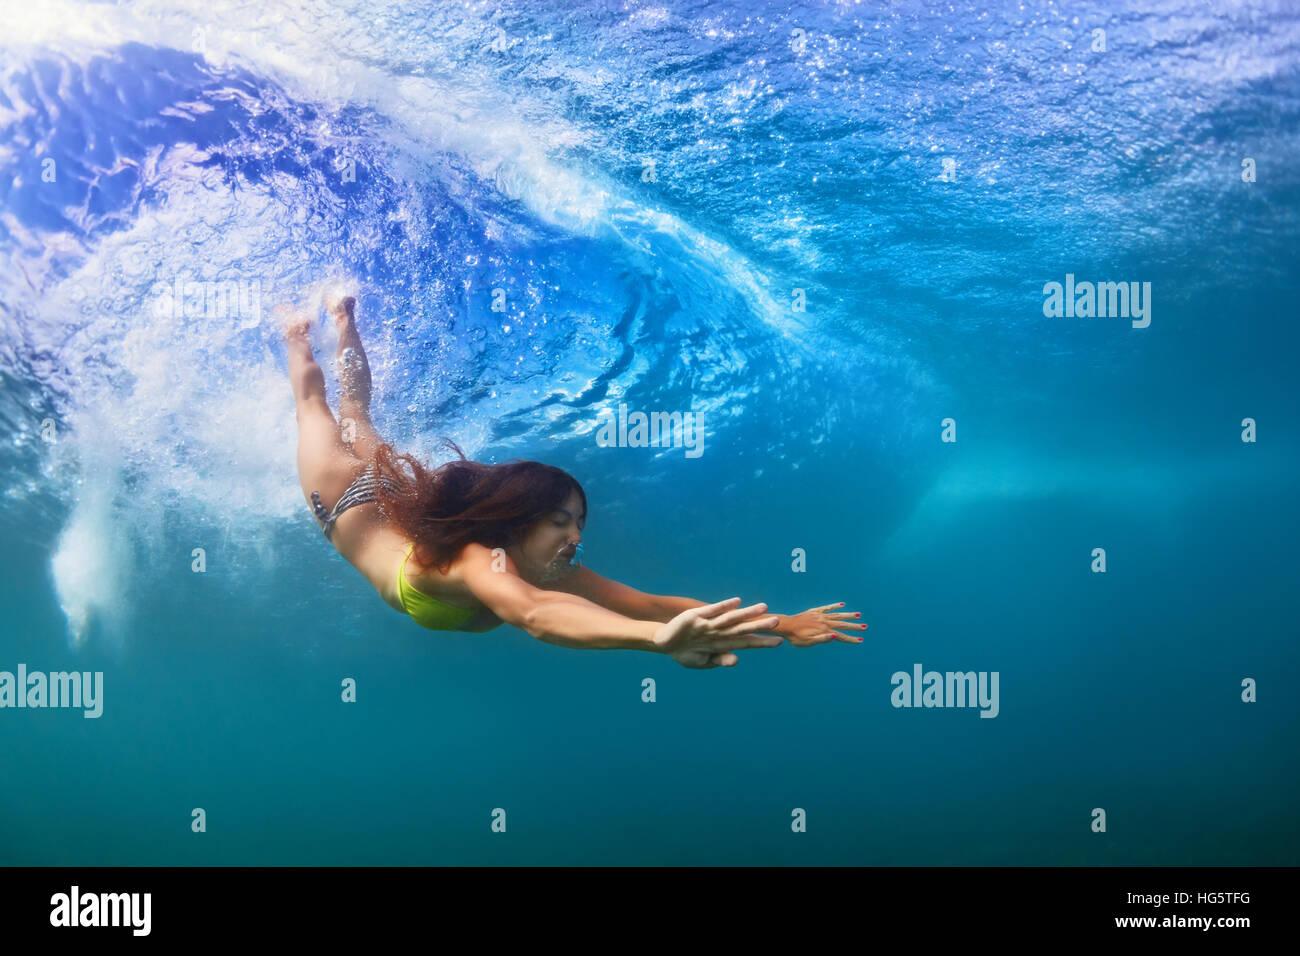 Surfer Girl Bali Wallpaper Young Sportive Girl In Bikini In Action Fit Woman Swim